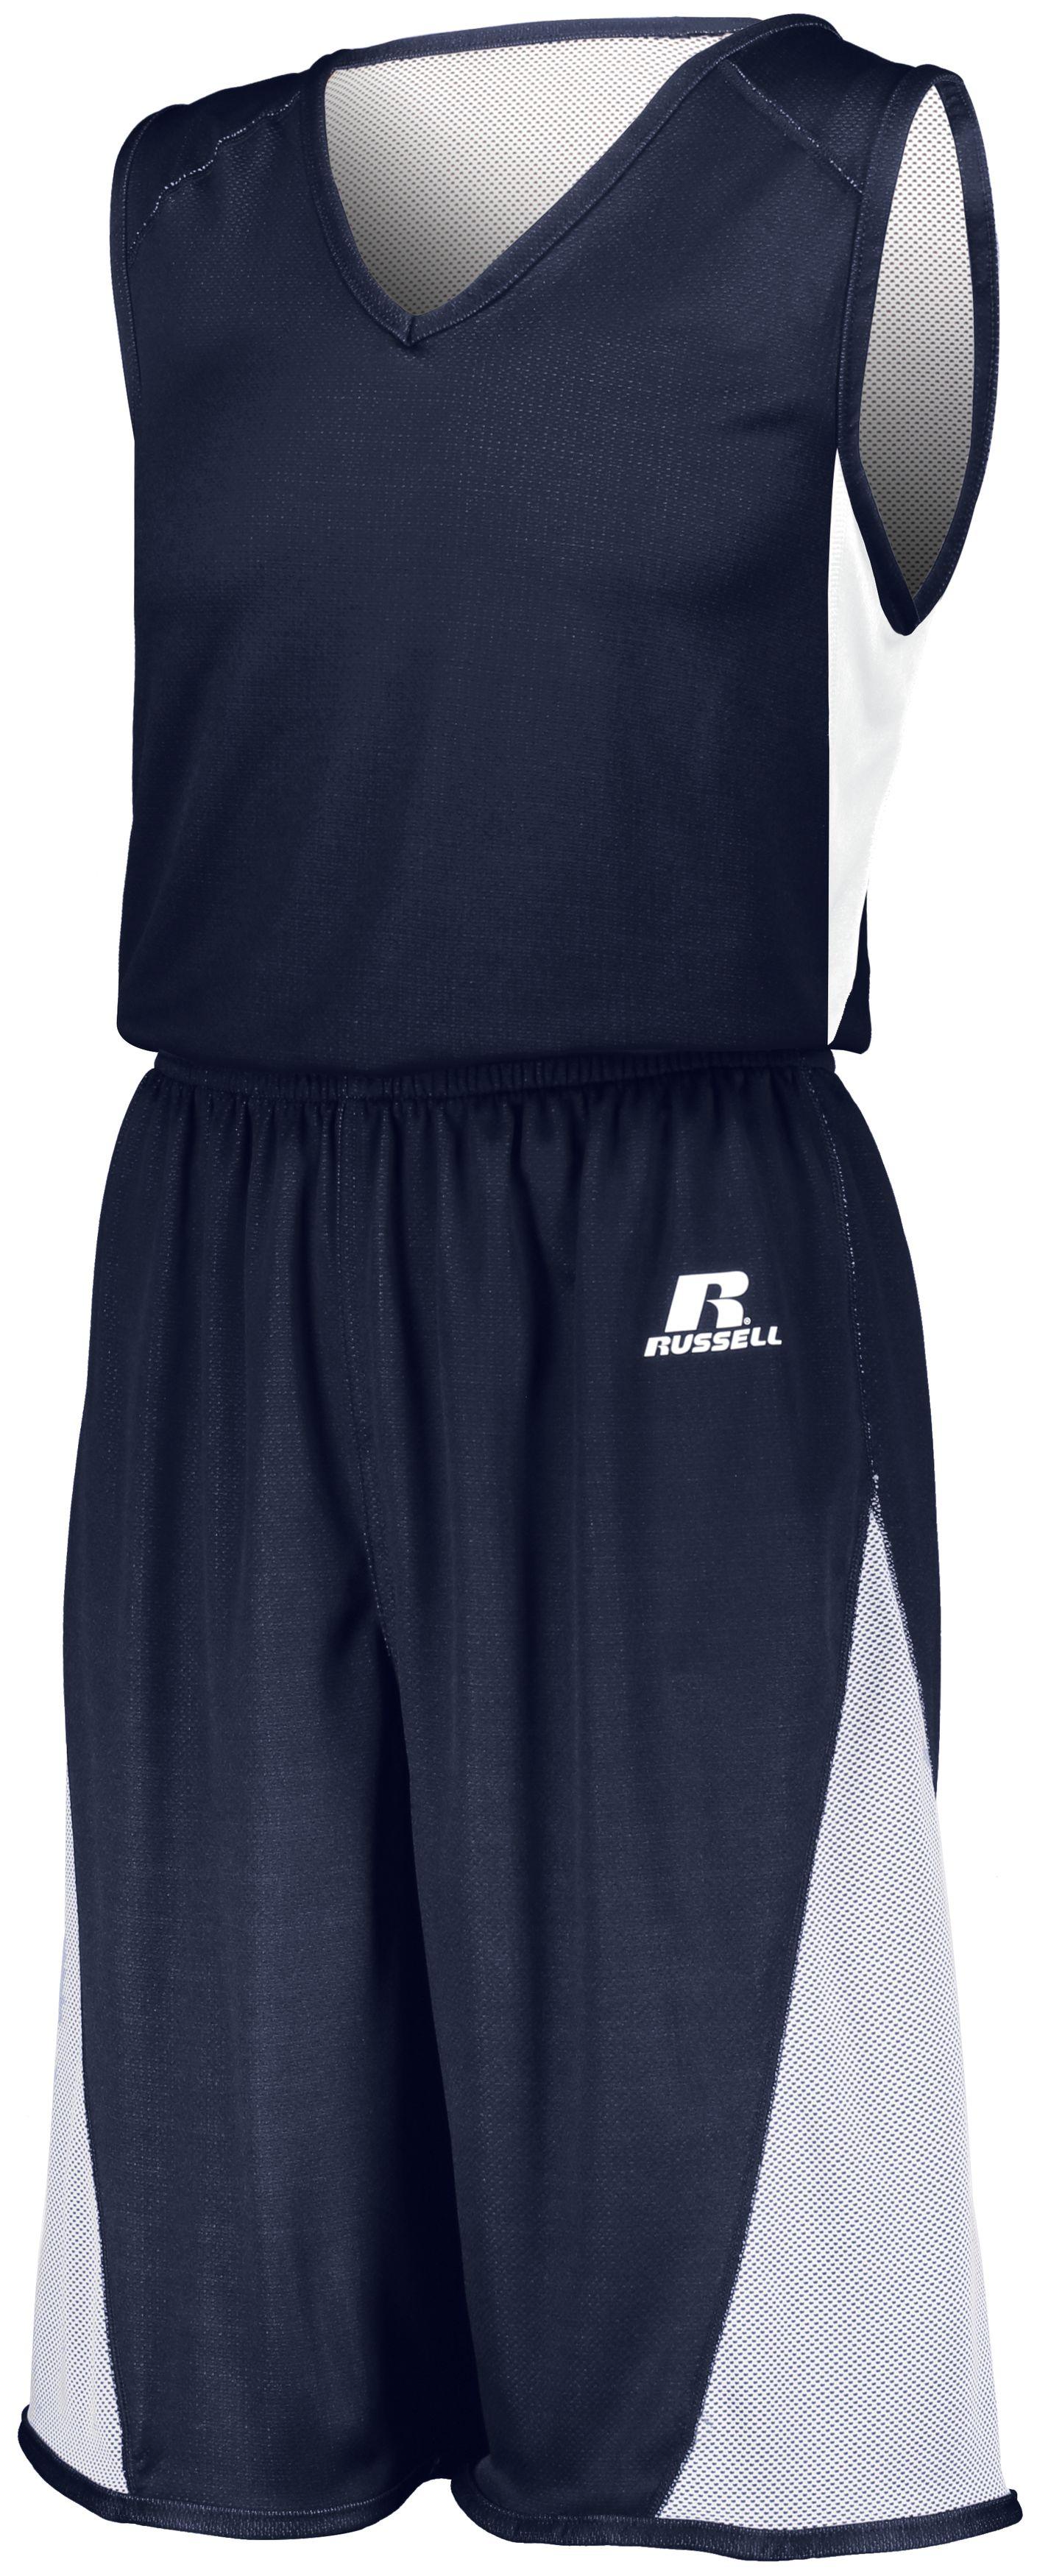 Undivided Single Ply Reversible Shorts - NAVY/WHITE